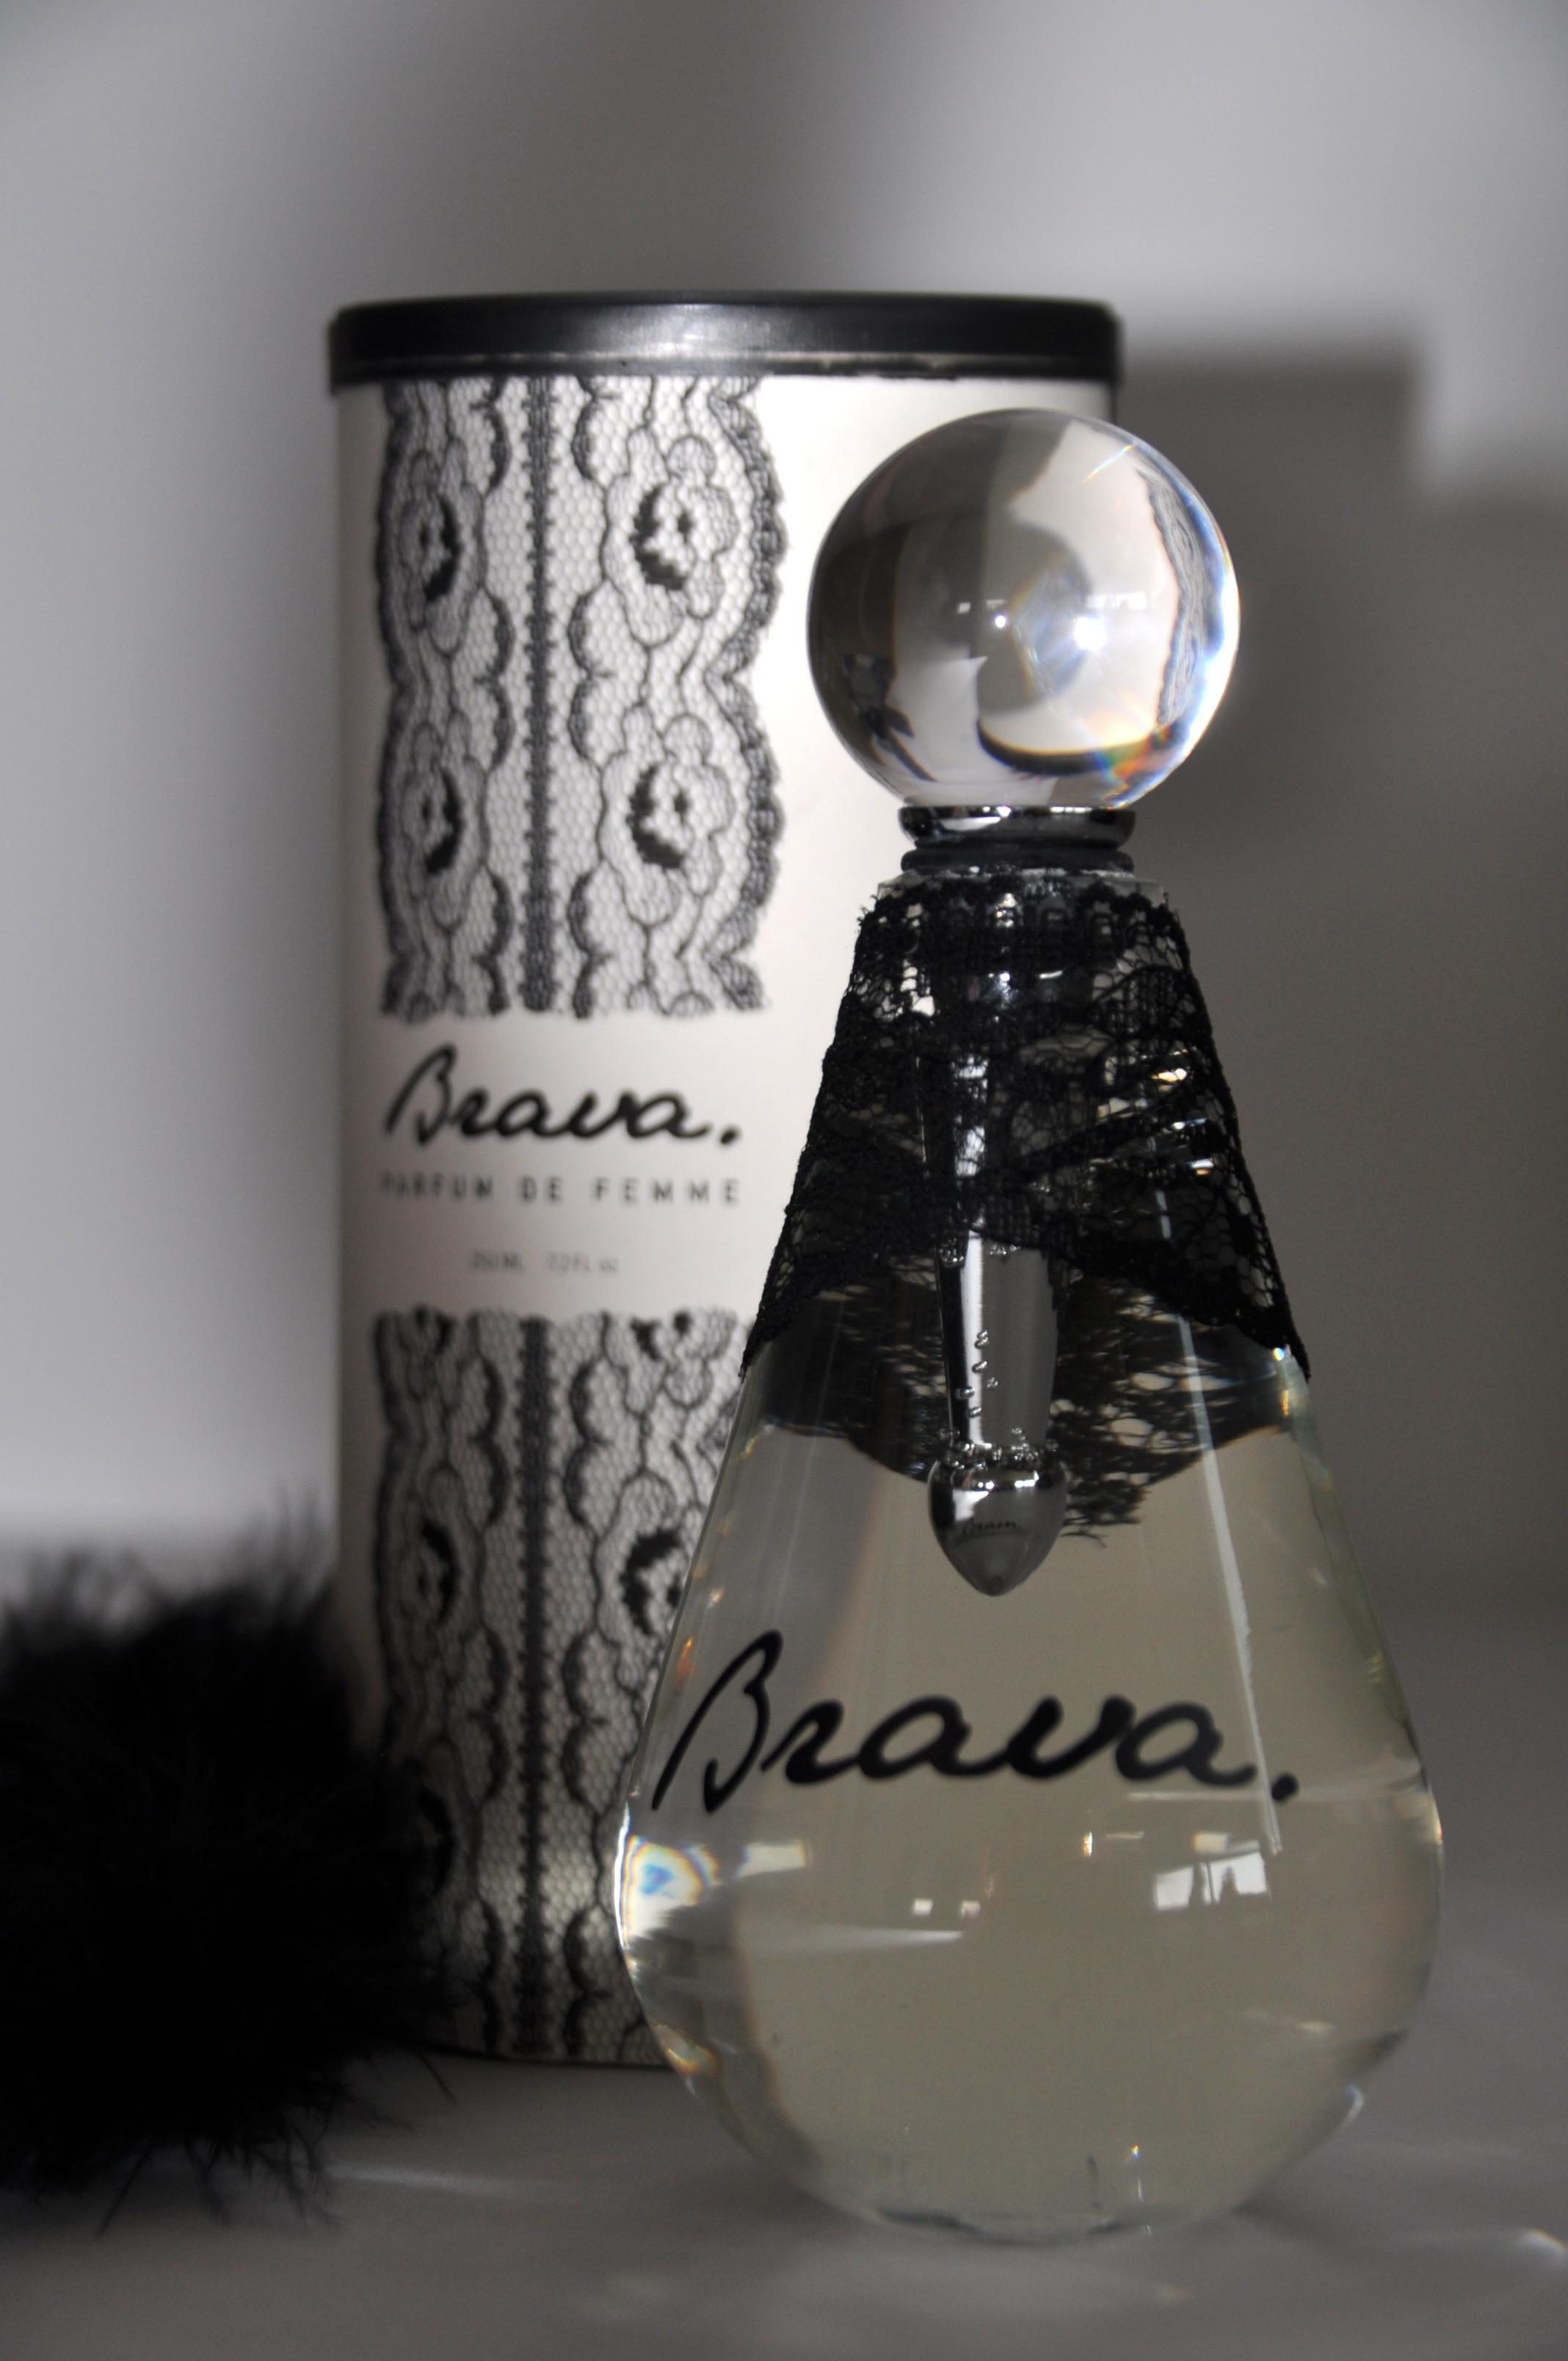 Perfume Brava